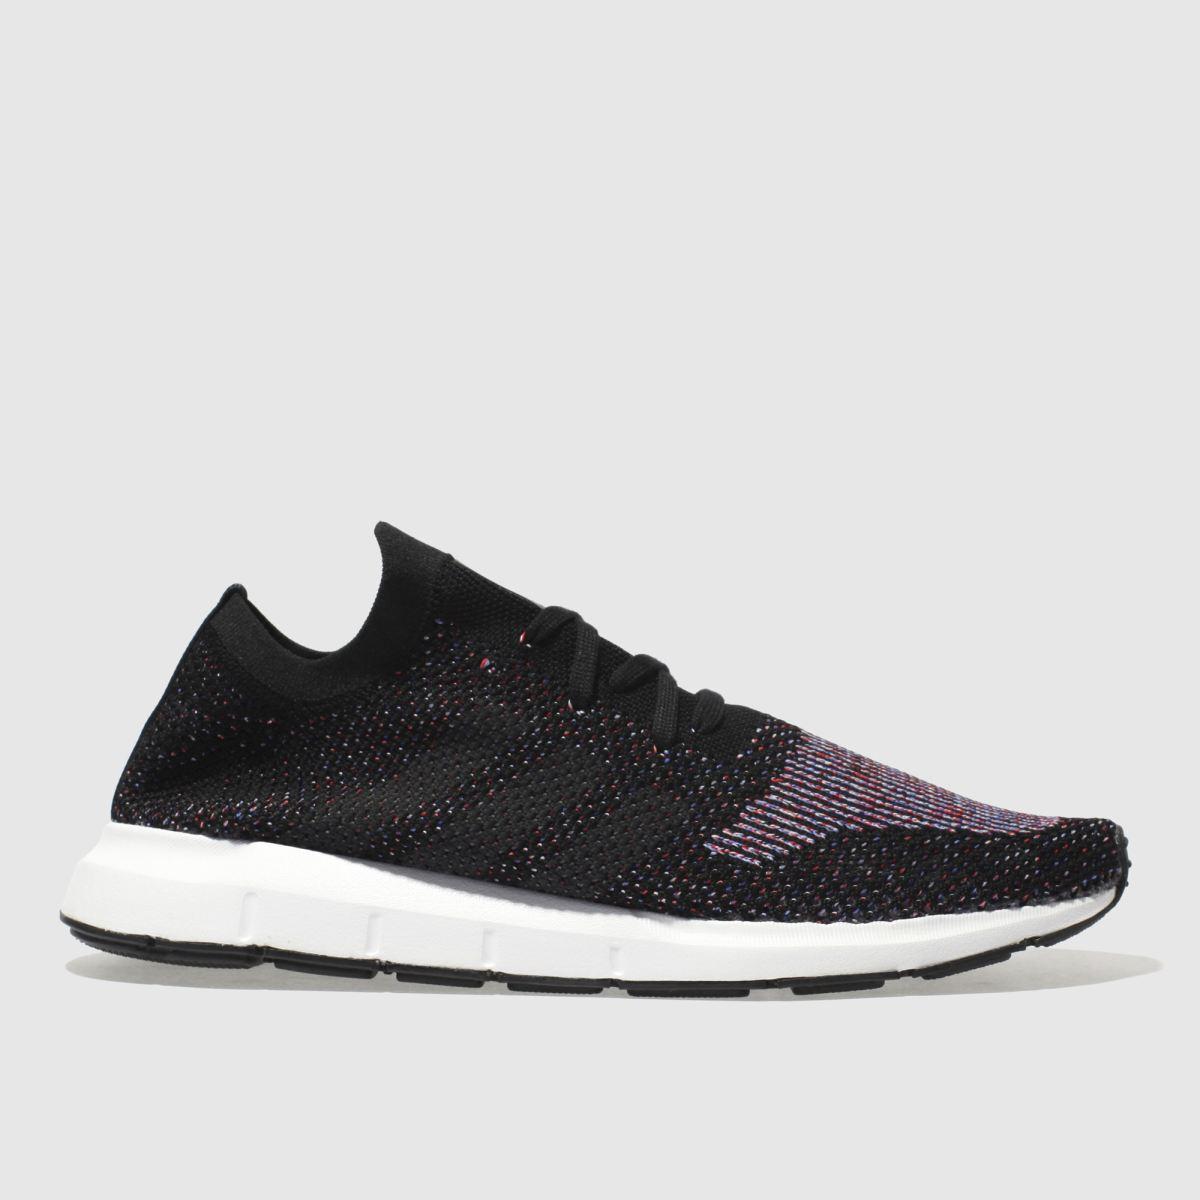 Adidas Black And Blue Swift Run Primeknit Trainers